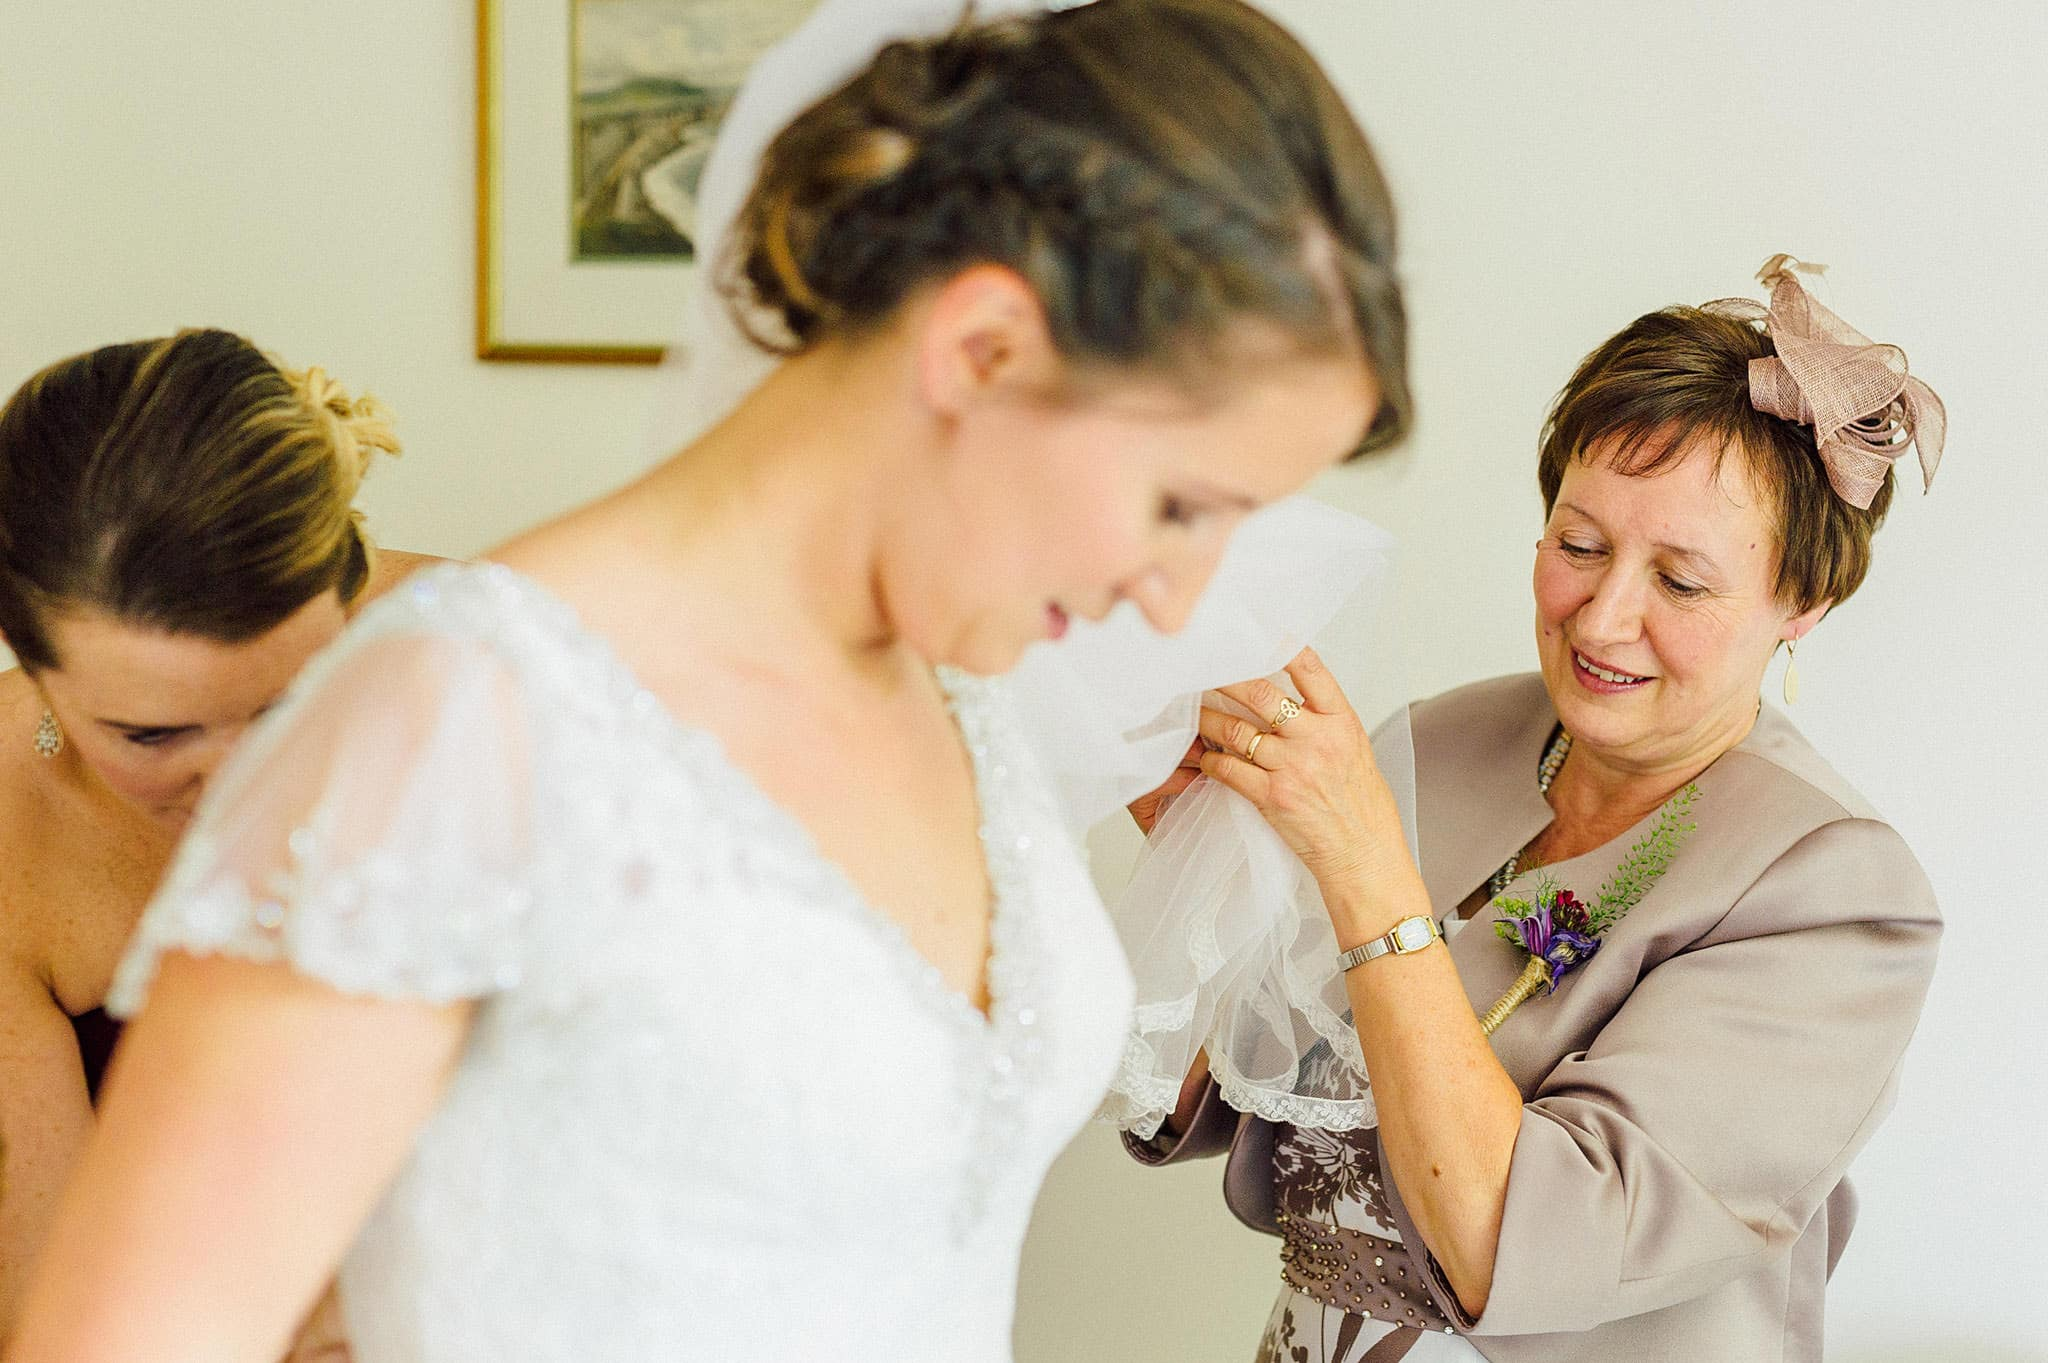 wedding-photographer-aberystwyth-wales (19)